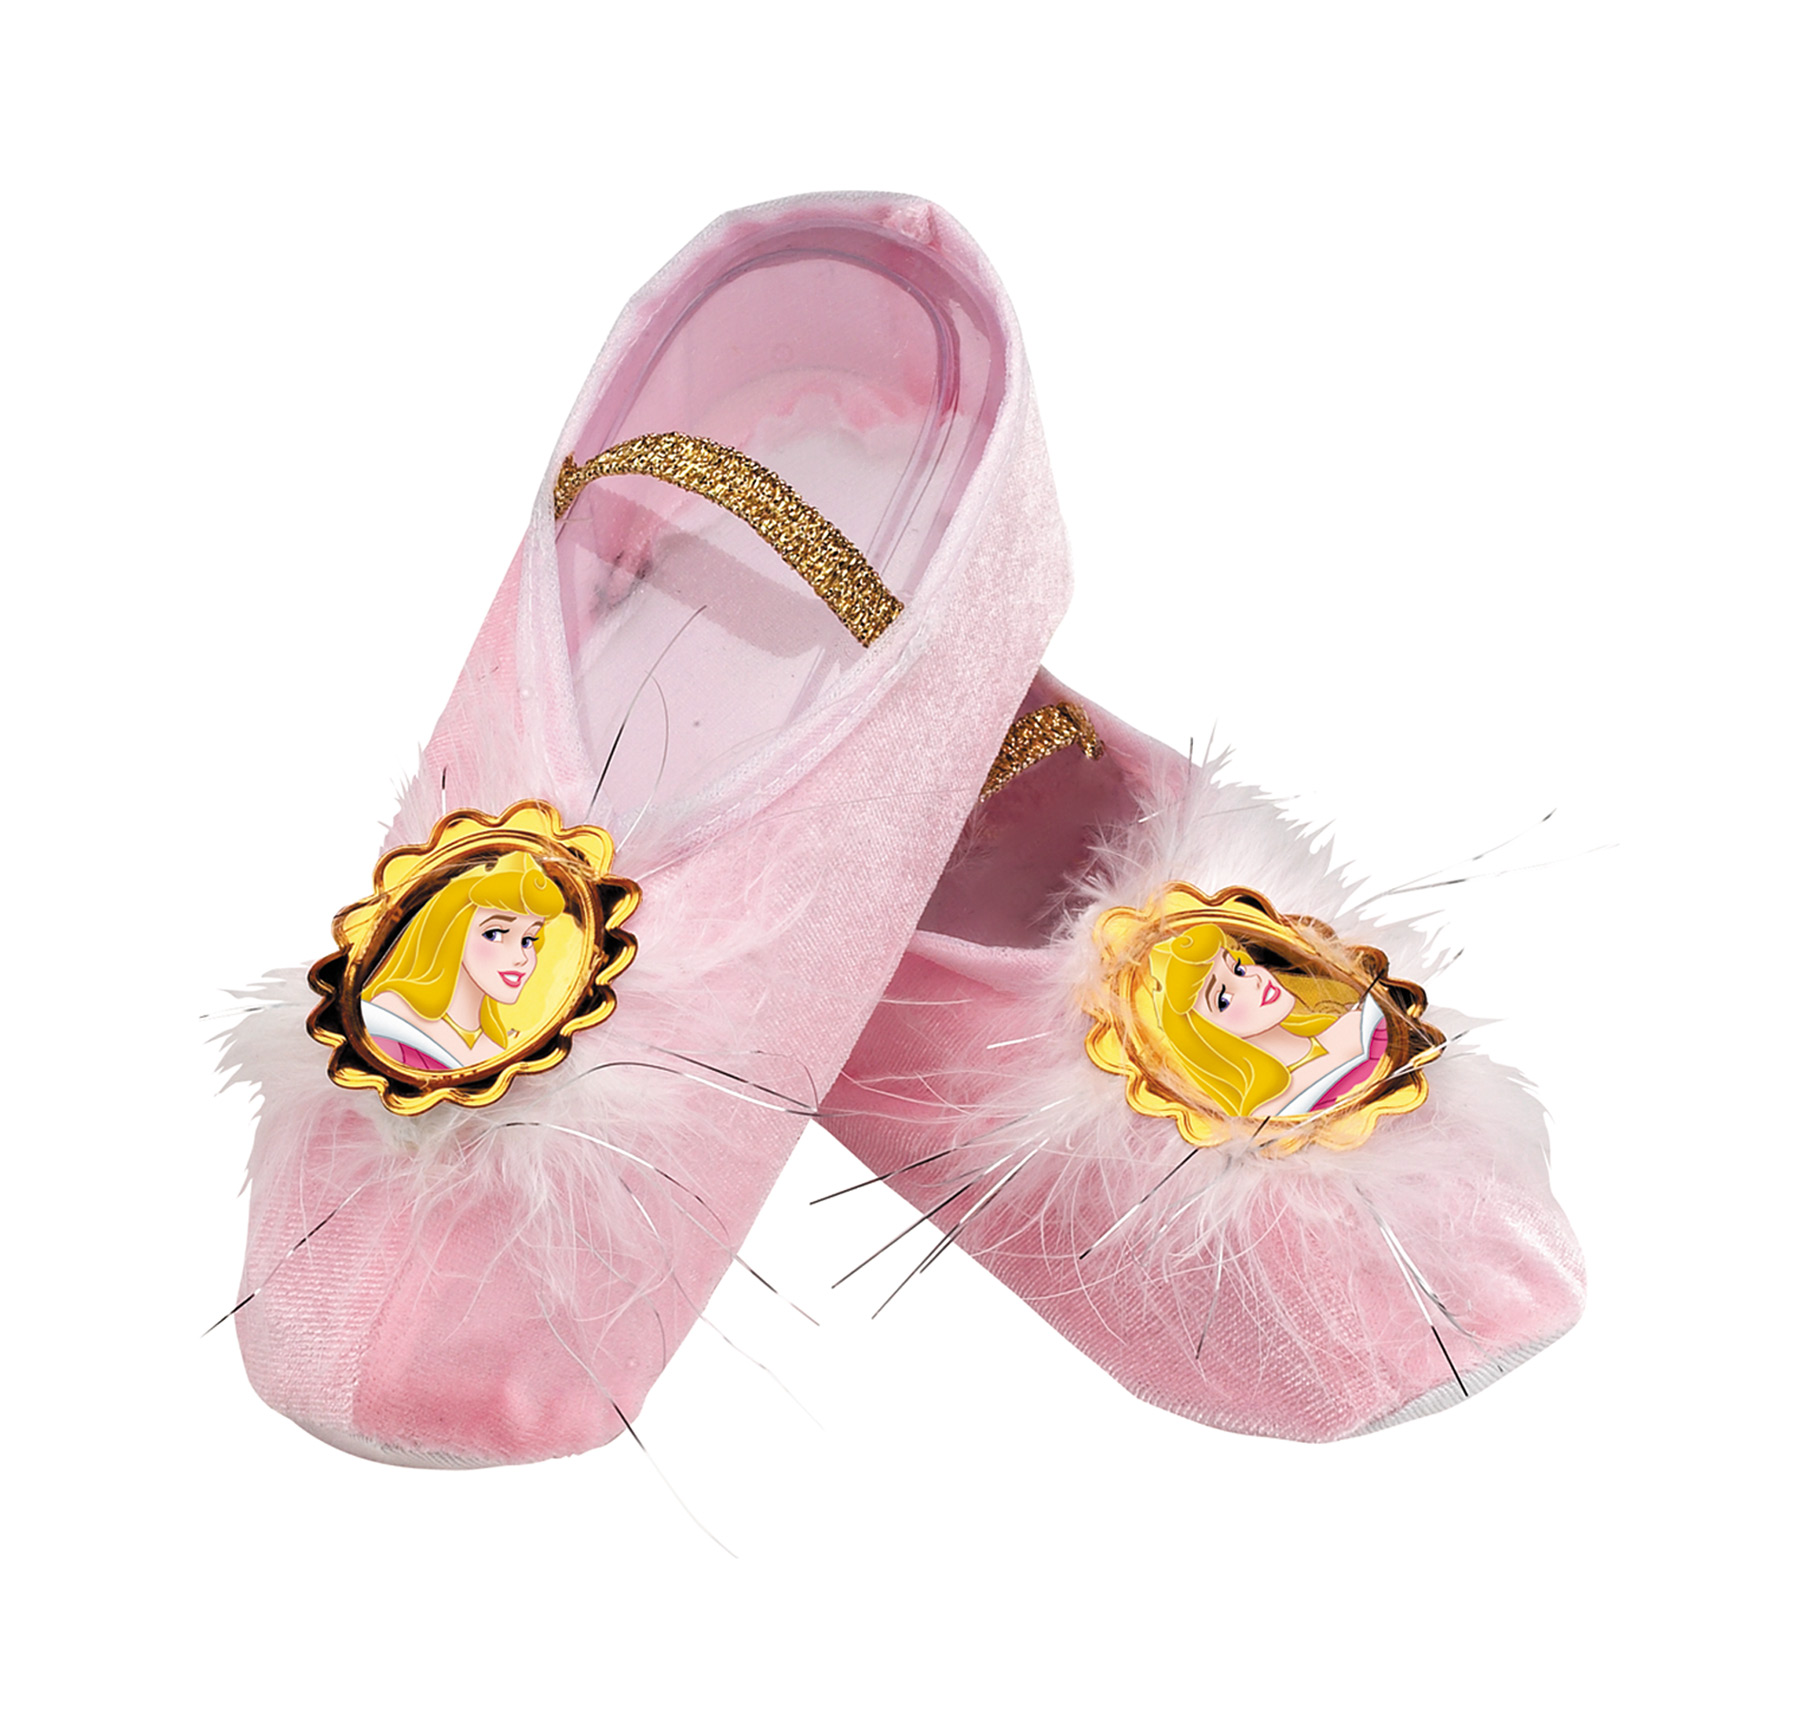 Disney Aurora Ballet Slippers Child Halloween Costume Accessory